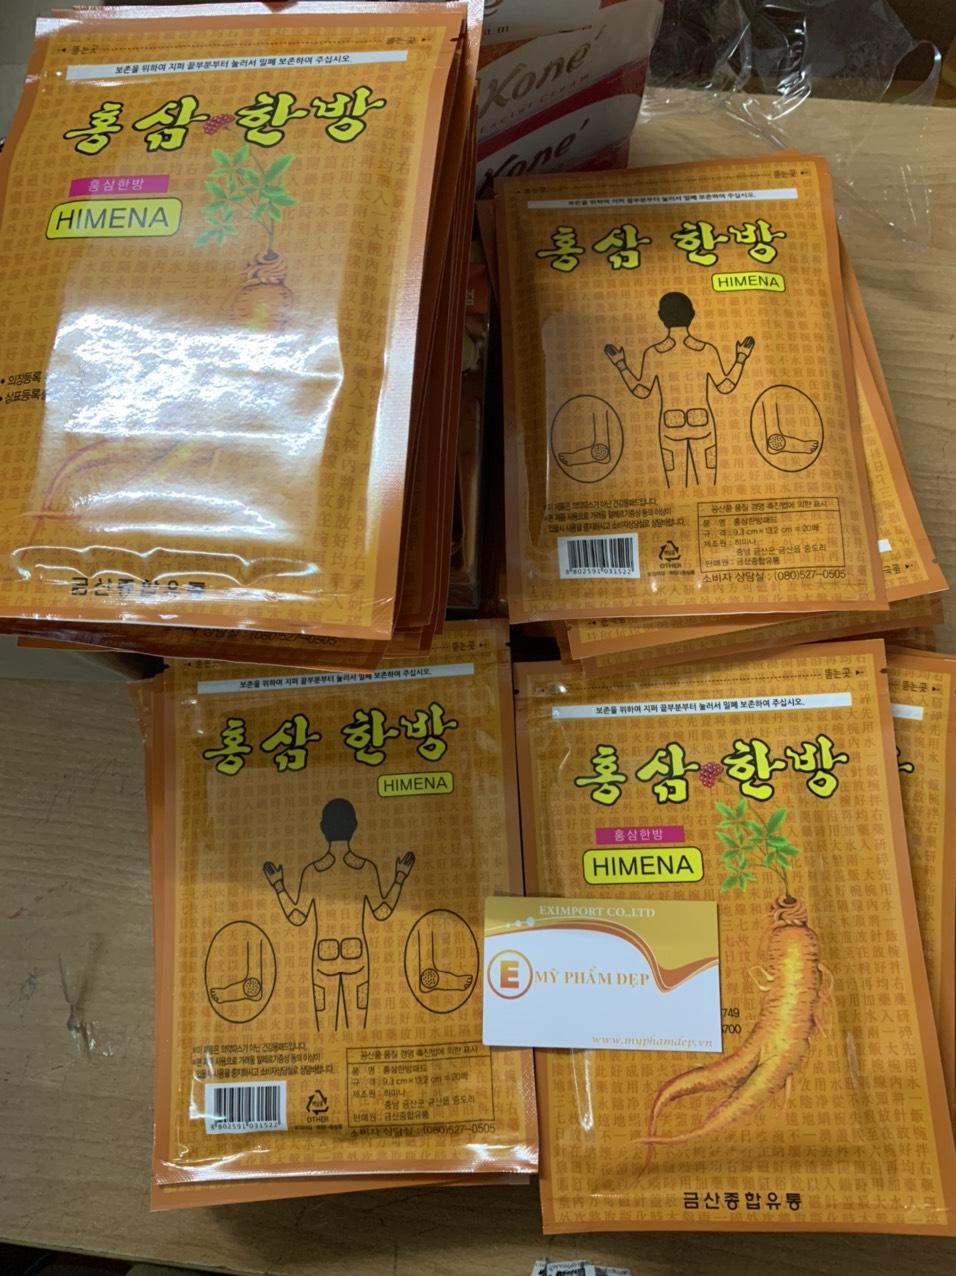 san-pham-khac-cao-dan-hong-sam-himena-han-quoc-tui-20-mieng-2664